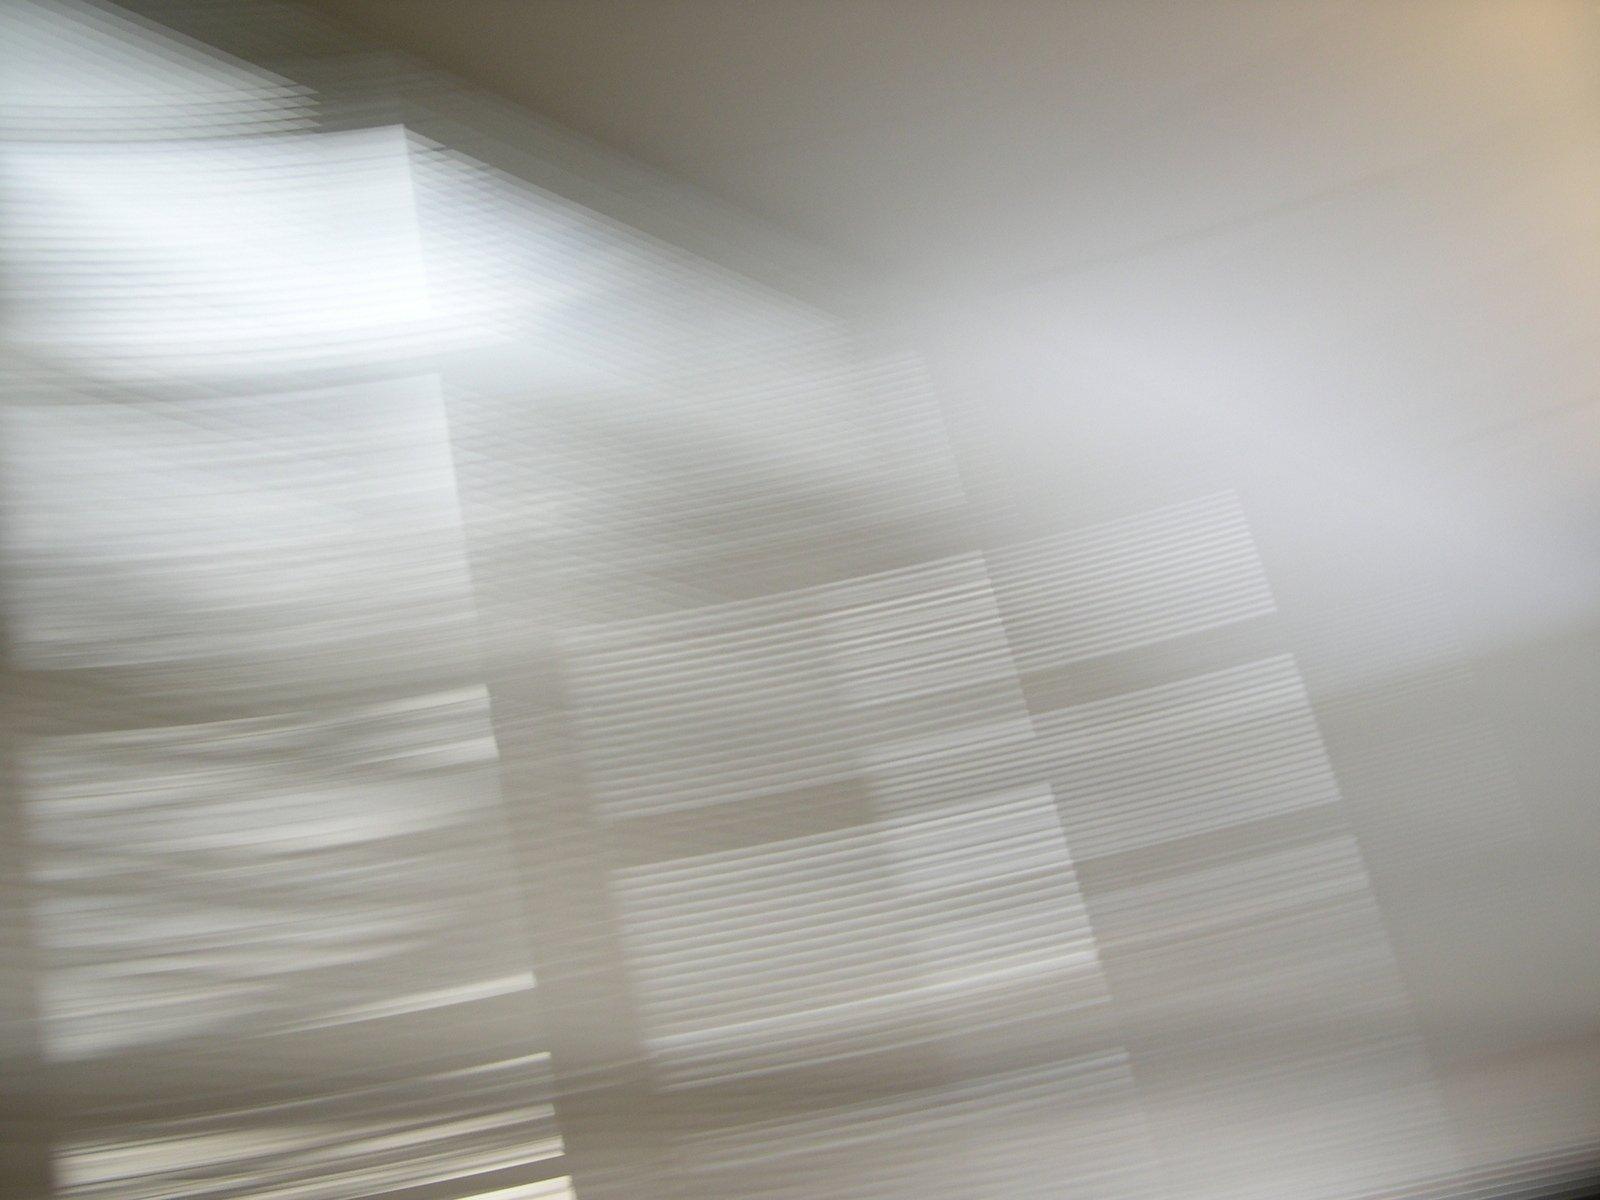 podlaha, svetlo